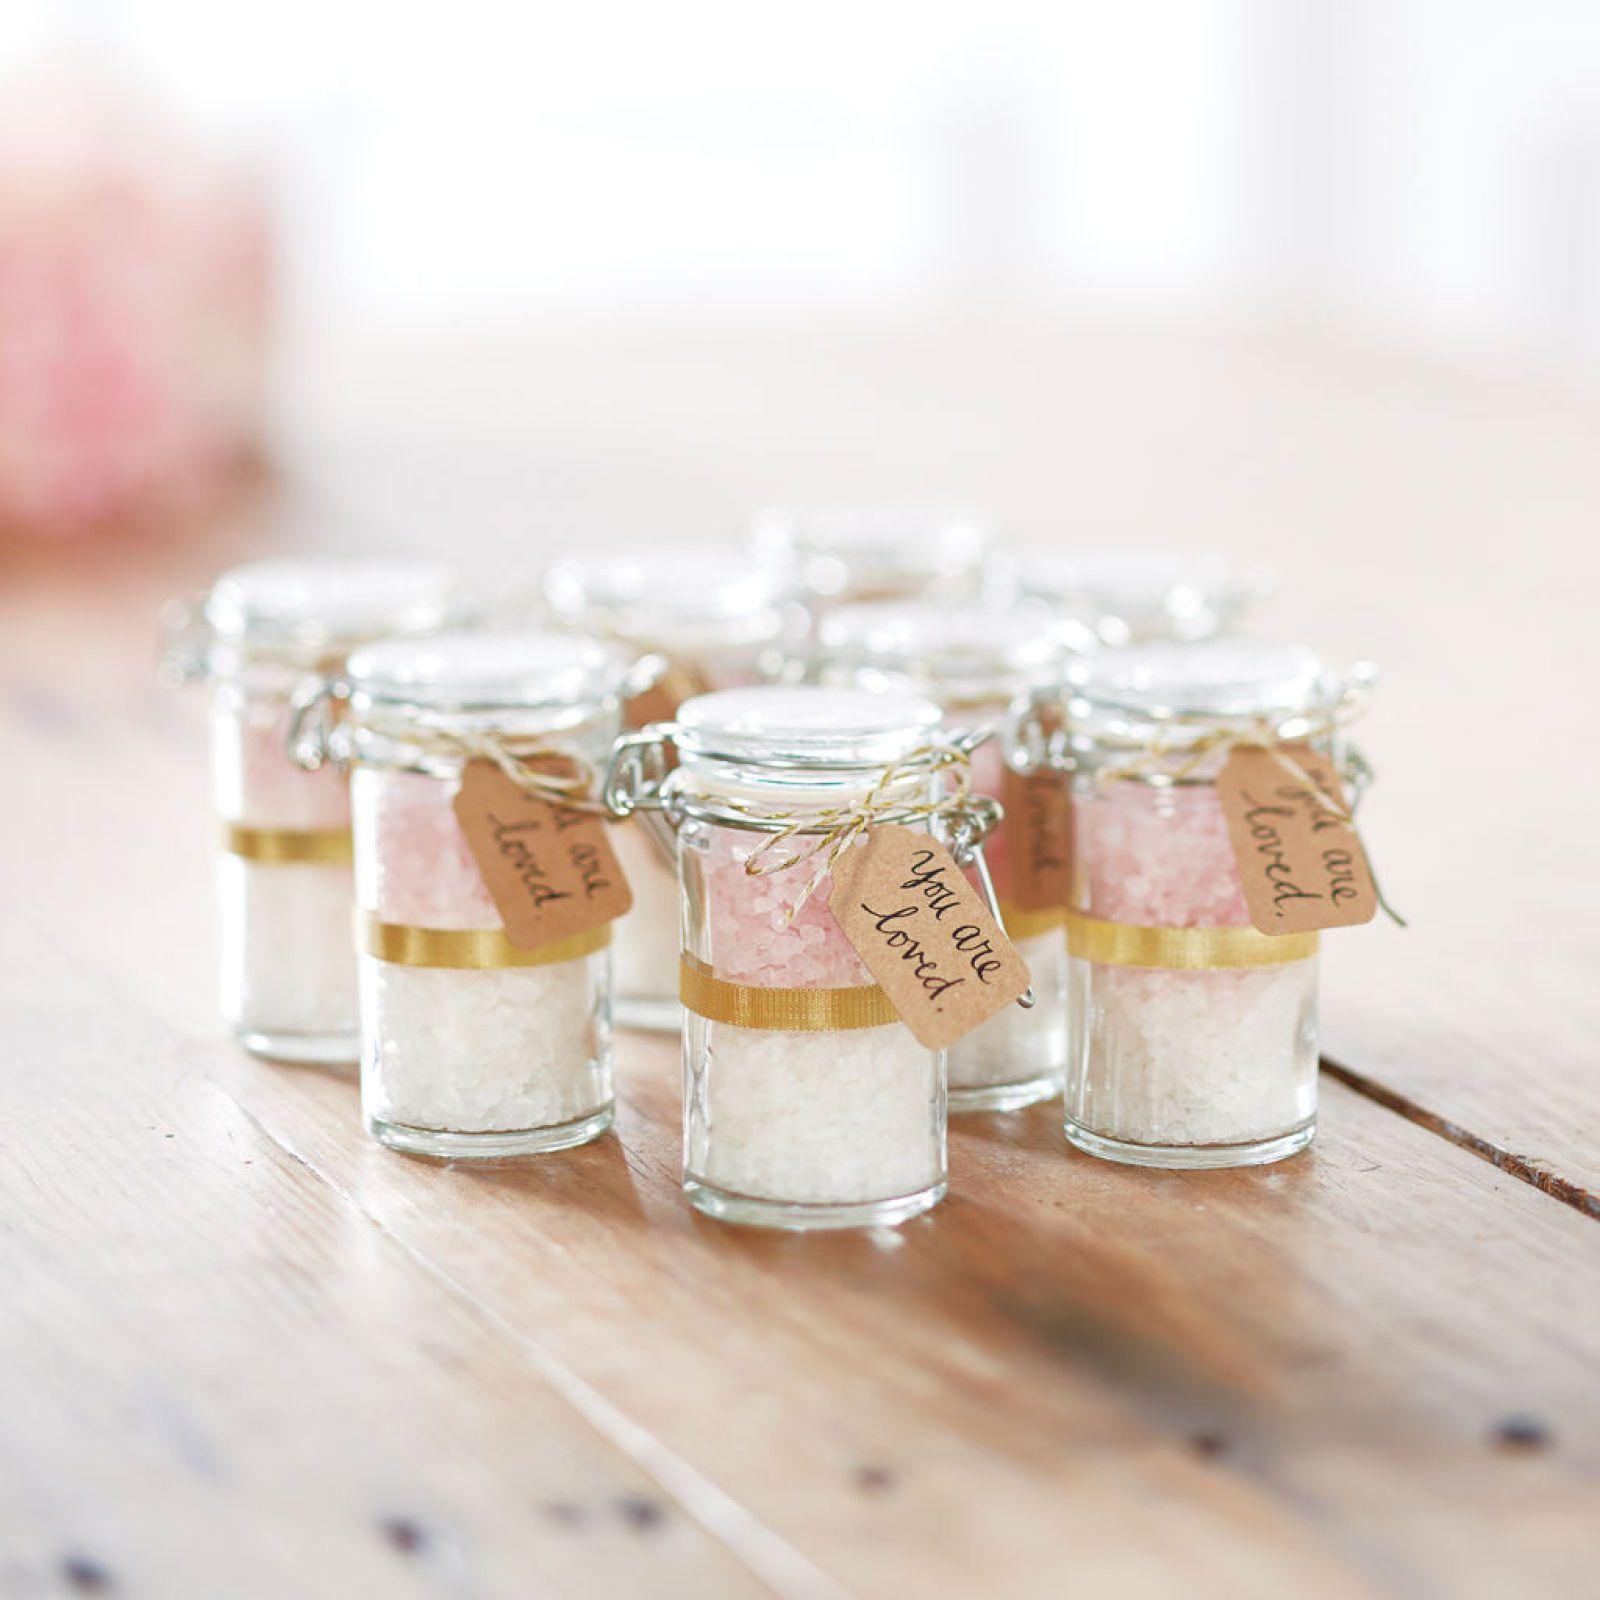 DIY Bath Salt Favor Jars | Wrapping & Homemade Gifts | Pinterest ...